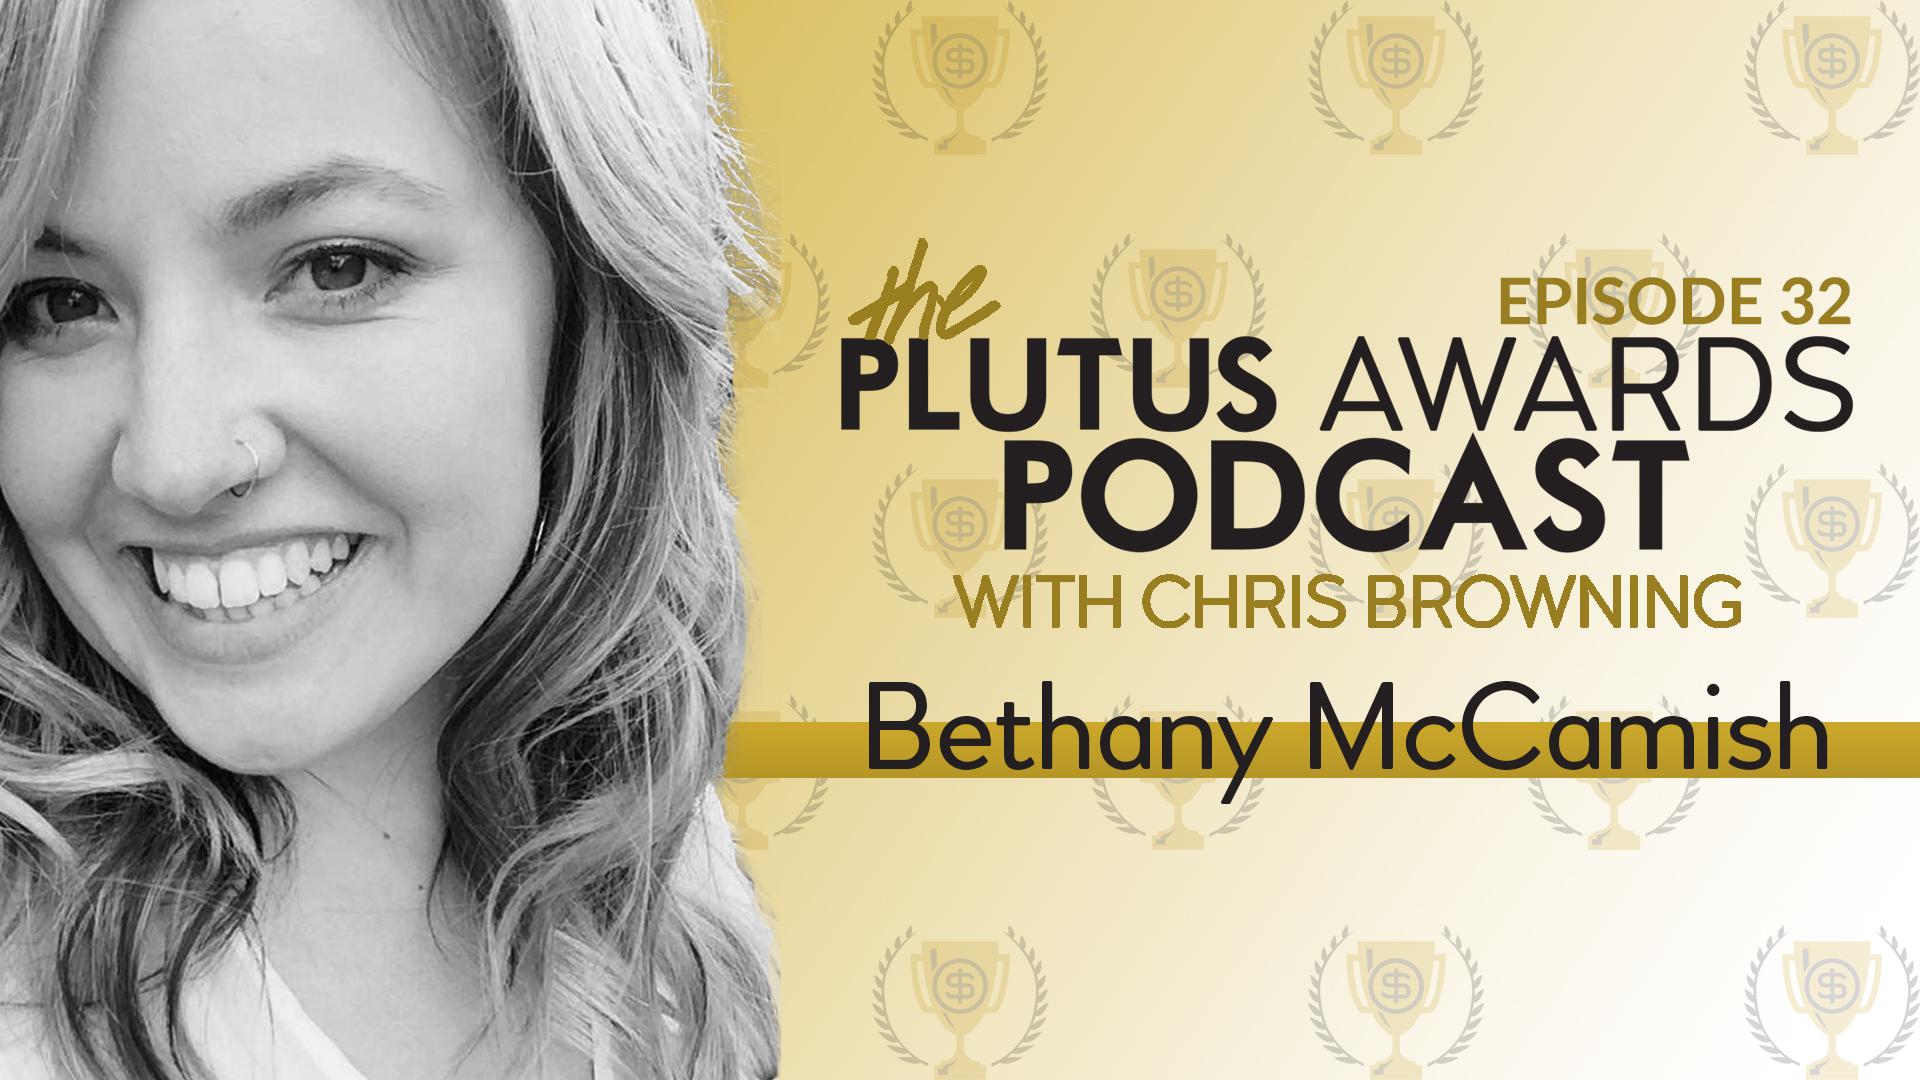 Plutus Awards Podcast Bethany McCamish Featured Image